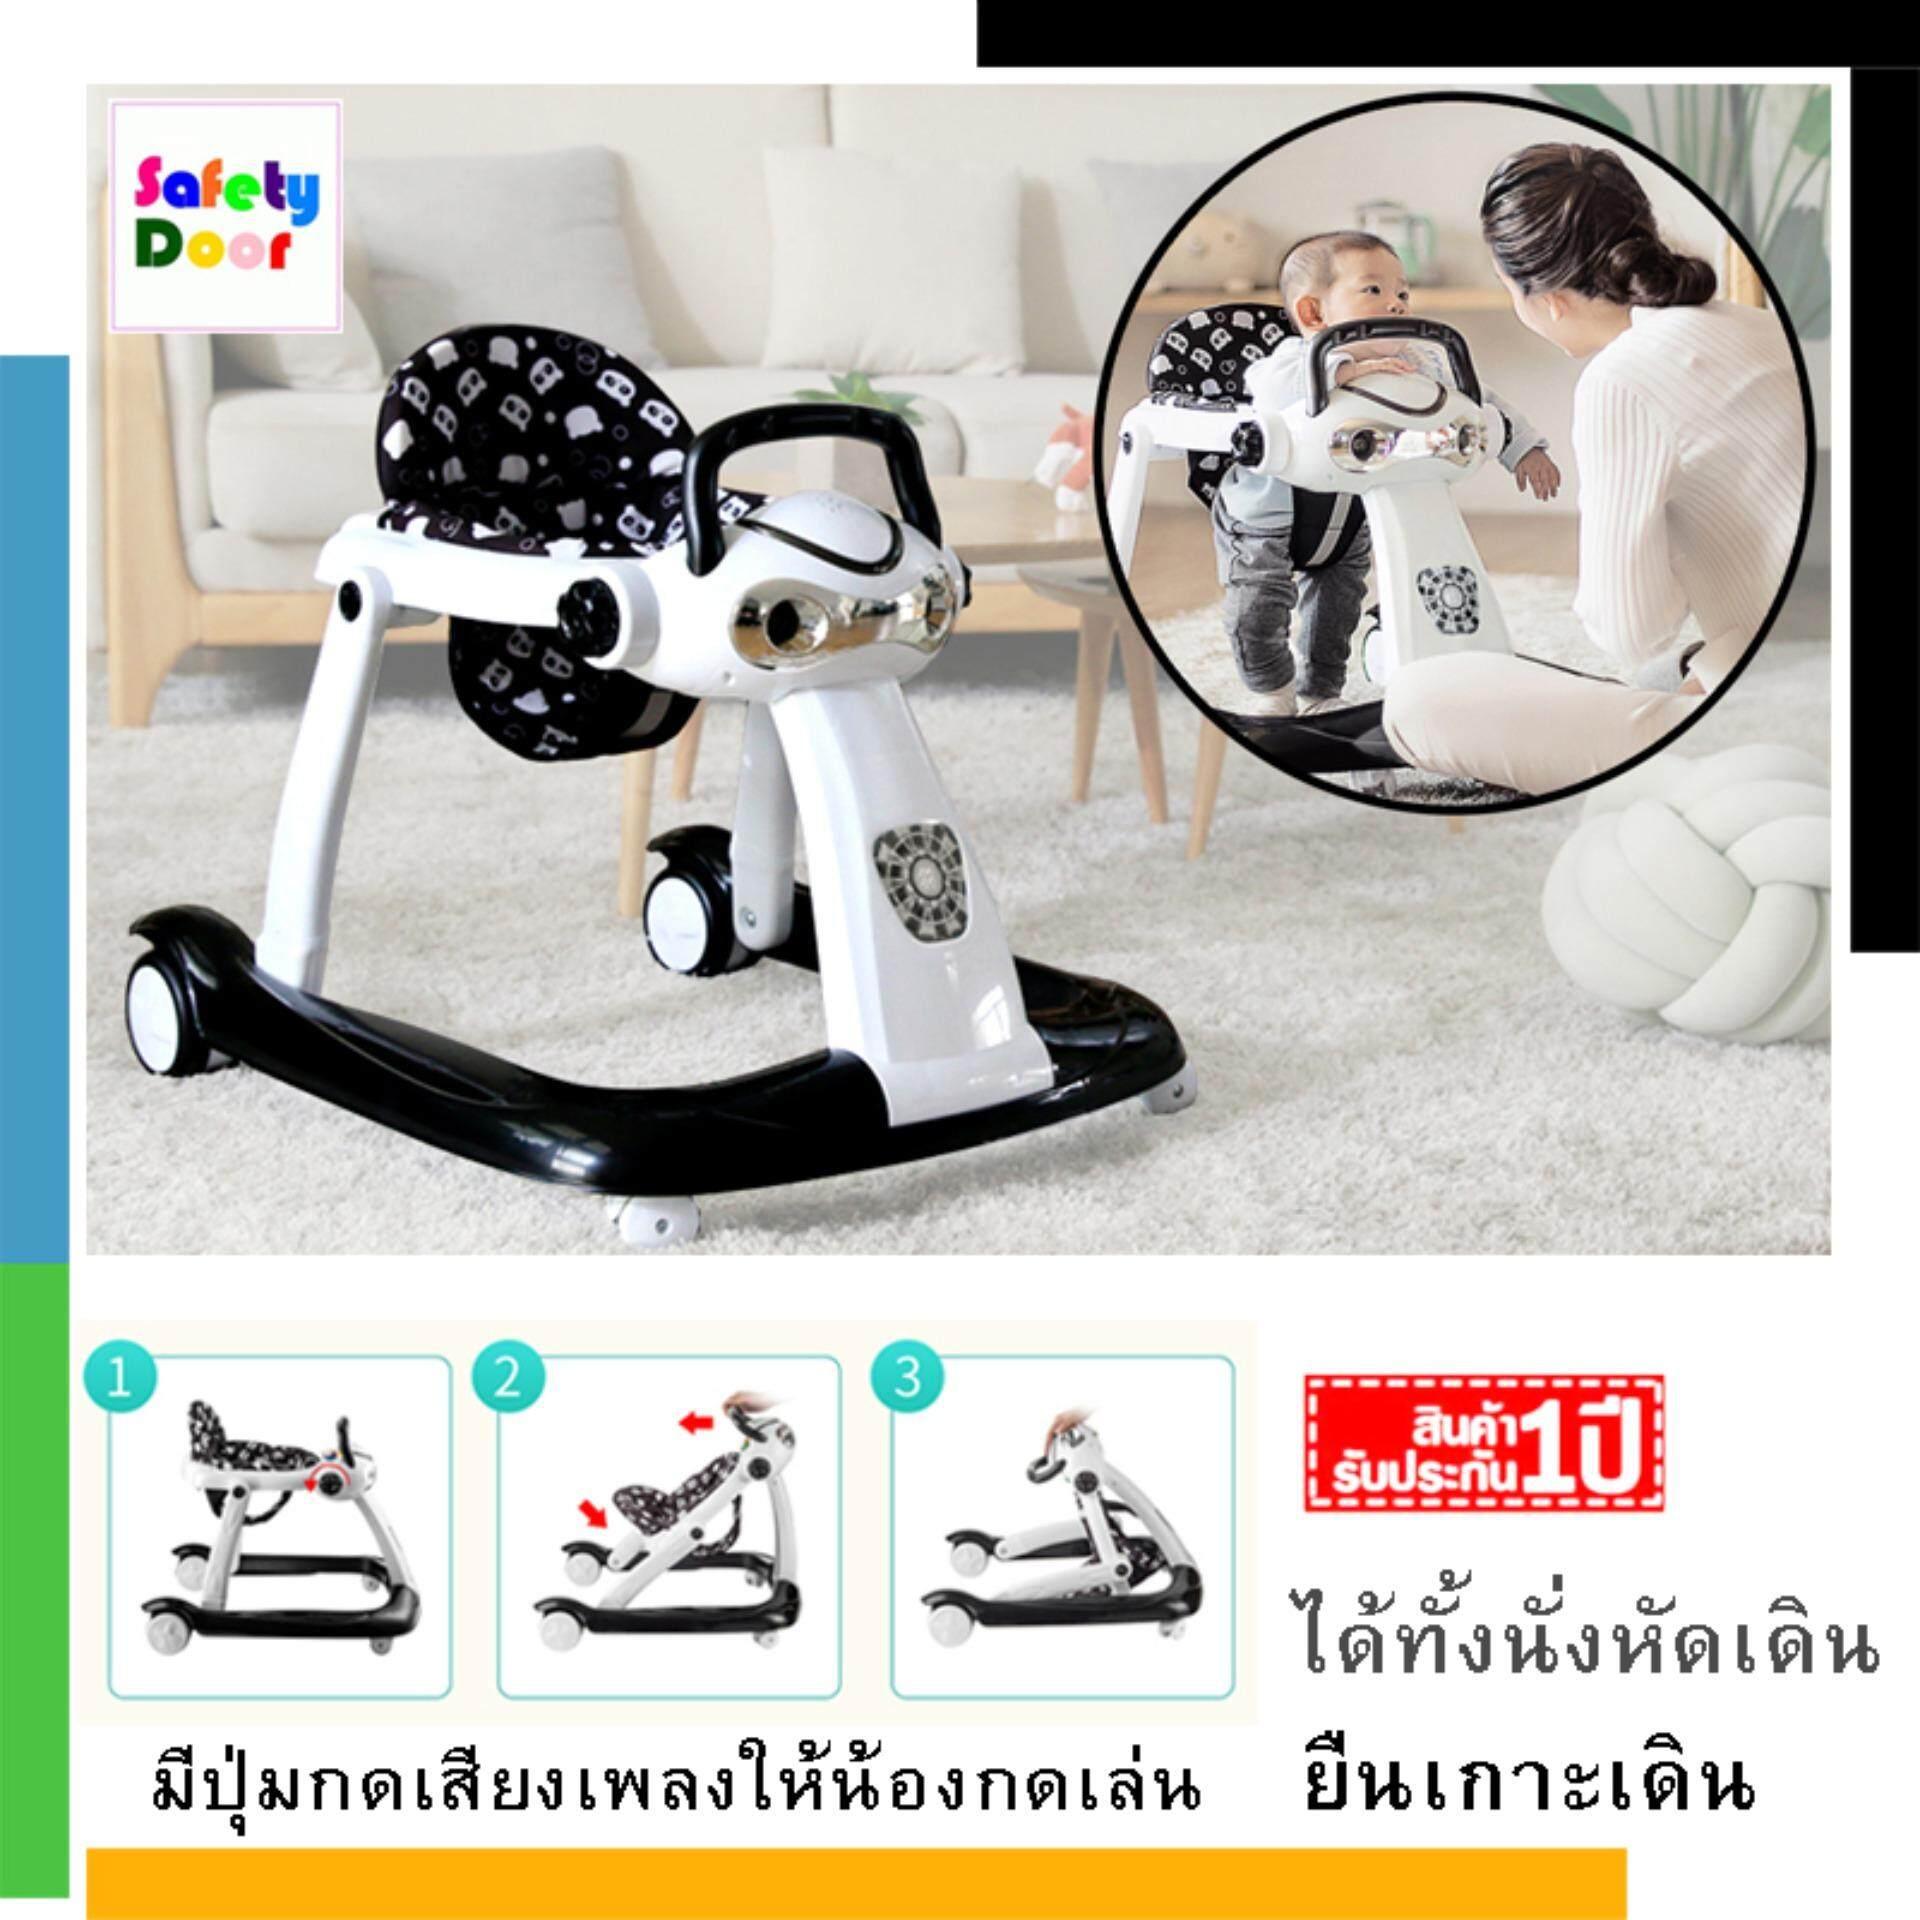 Baby walker รถหัดเดิน รถผลักเดิน 2in1 มีเสียงดนตรี และของเล่น ปรับเป็นแบบนั่ง หรือแบบผลักเดินได้ (สีขาว/ดำ)